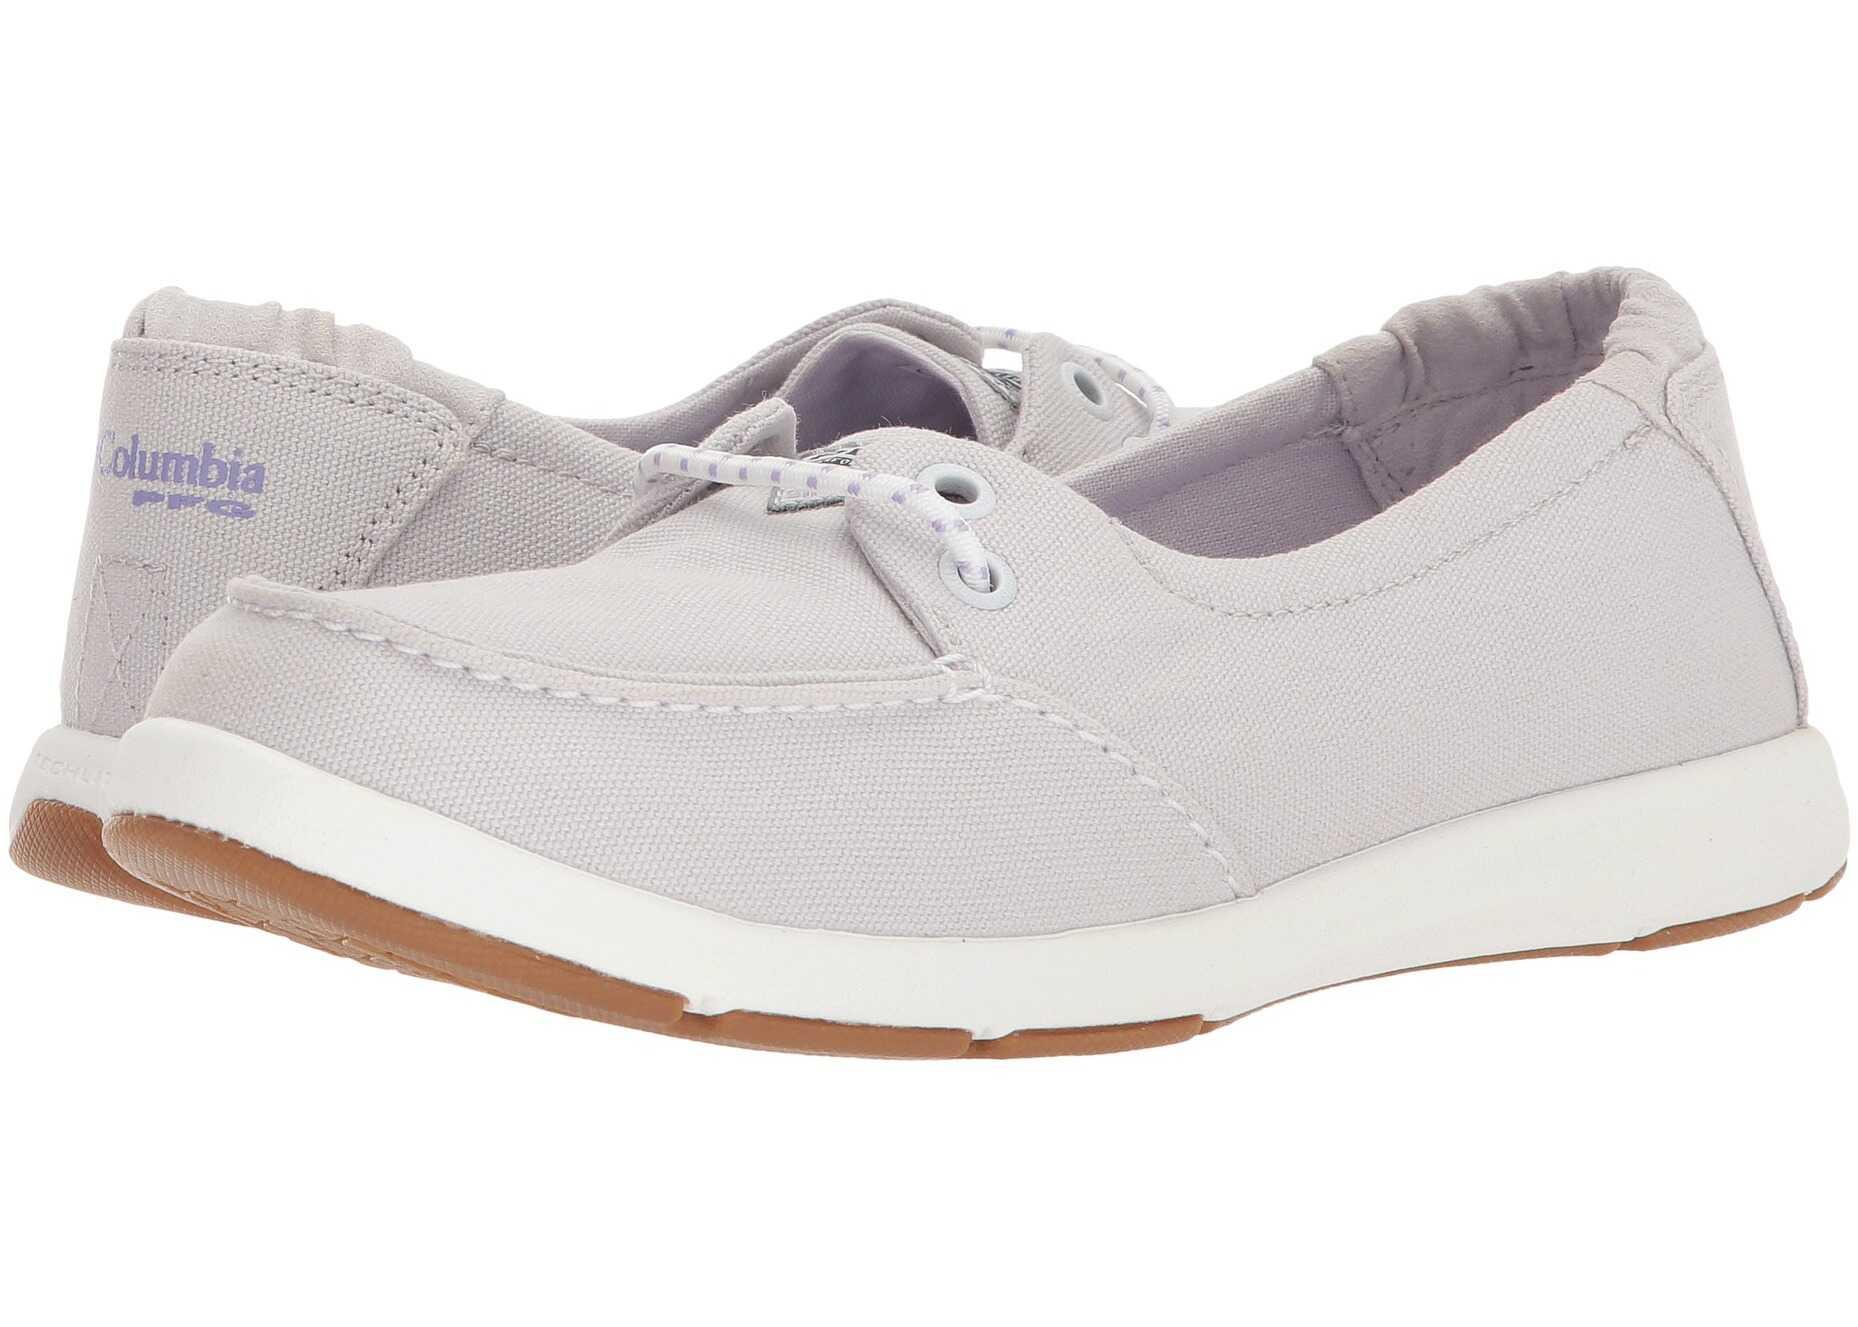 Columbia Delray PFG Silver Grey/Soft Violet